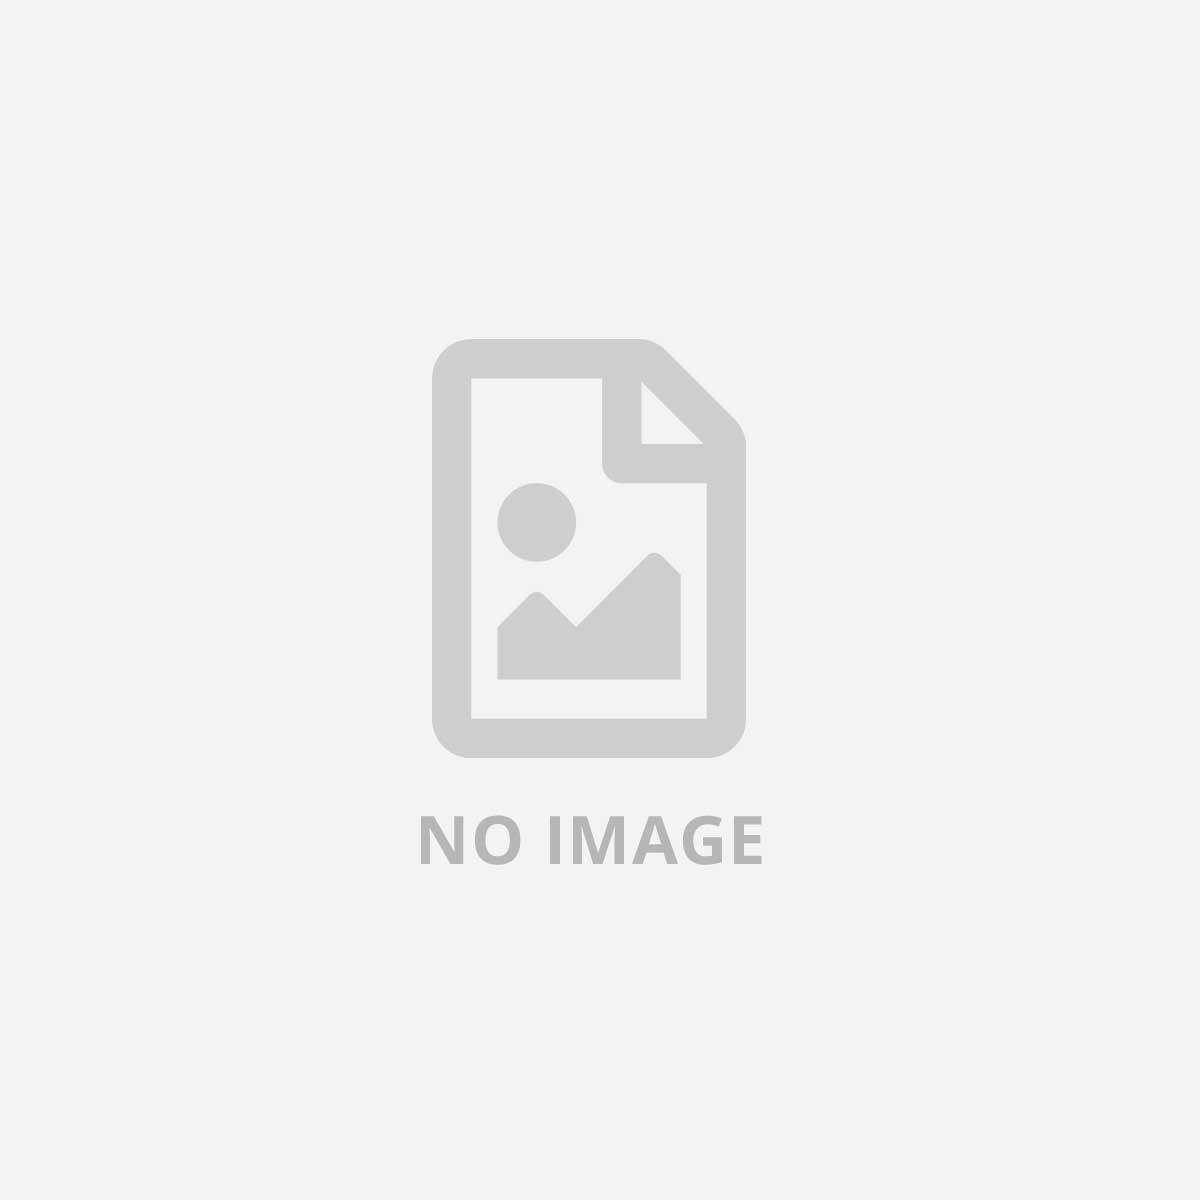 AEROHIVE NETWORKS AP150W INBOX ACC-FLAT MM ETHNET CBL